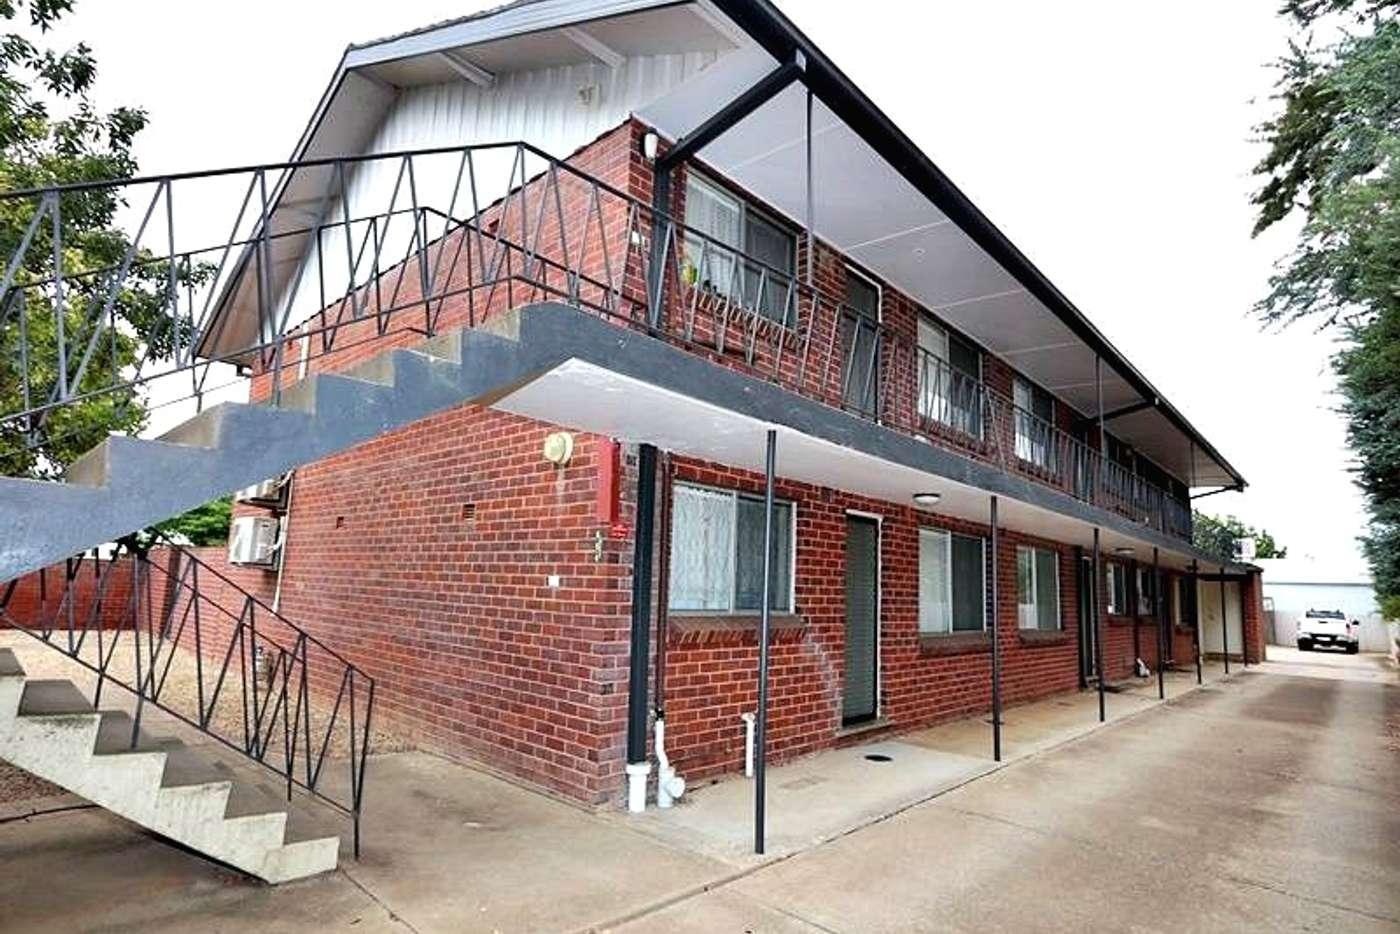 Main view of Homely unit listing, 2/80 Docker Street, Wagga Wagga NSW 2650